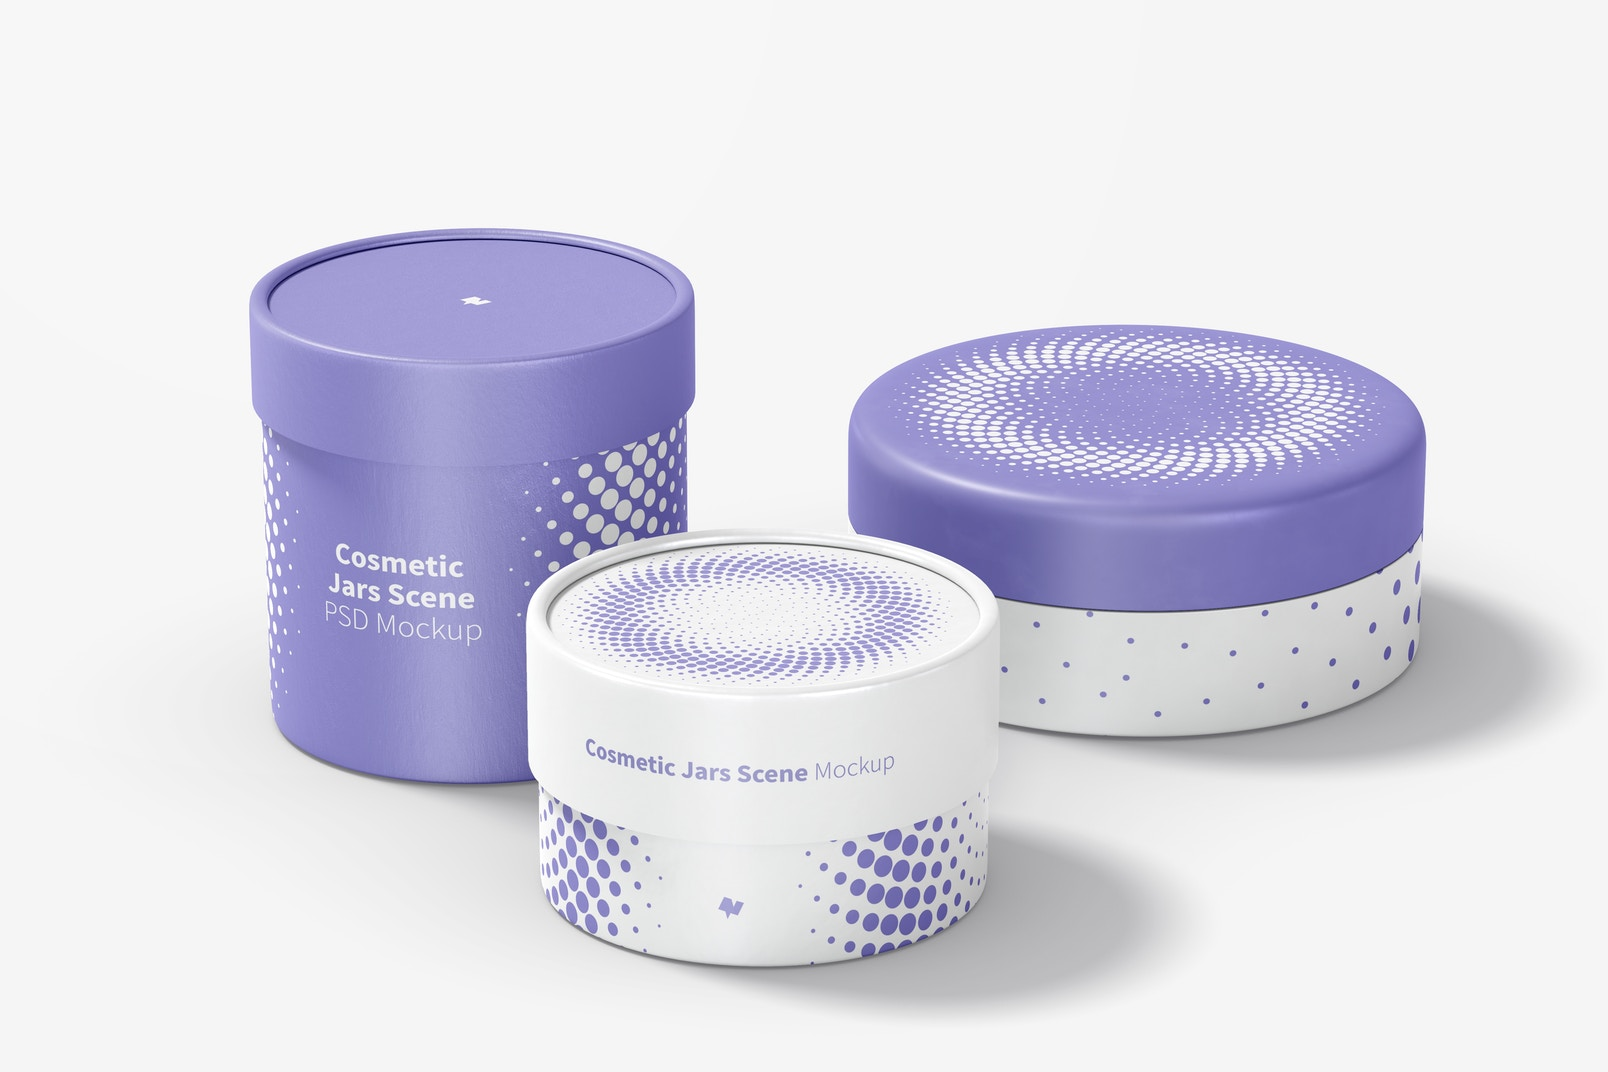 Cosmetic Jars Scene Mockup, Perspective View